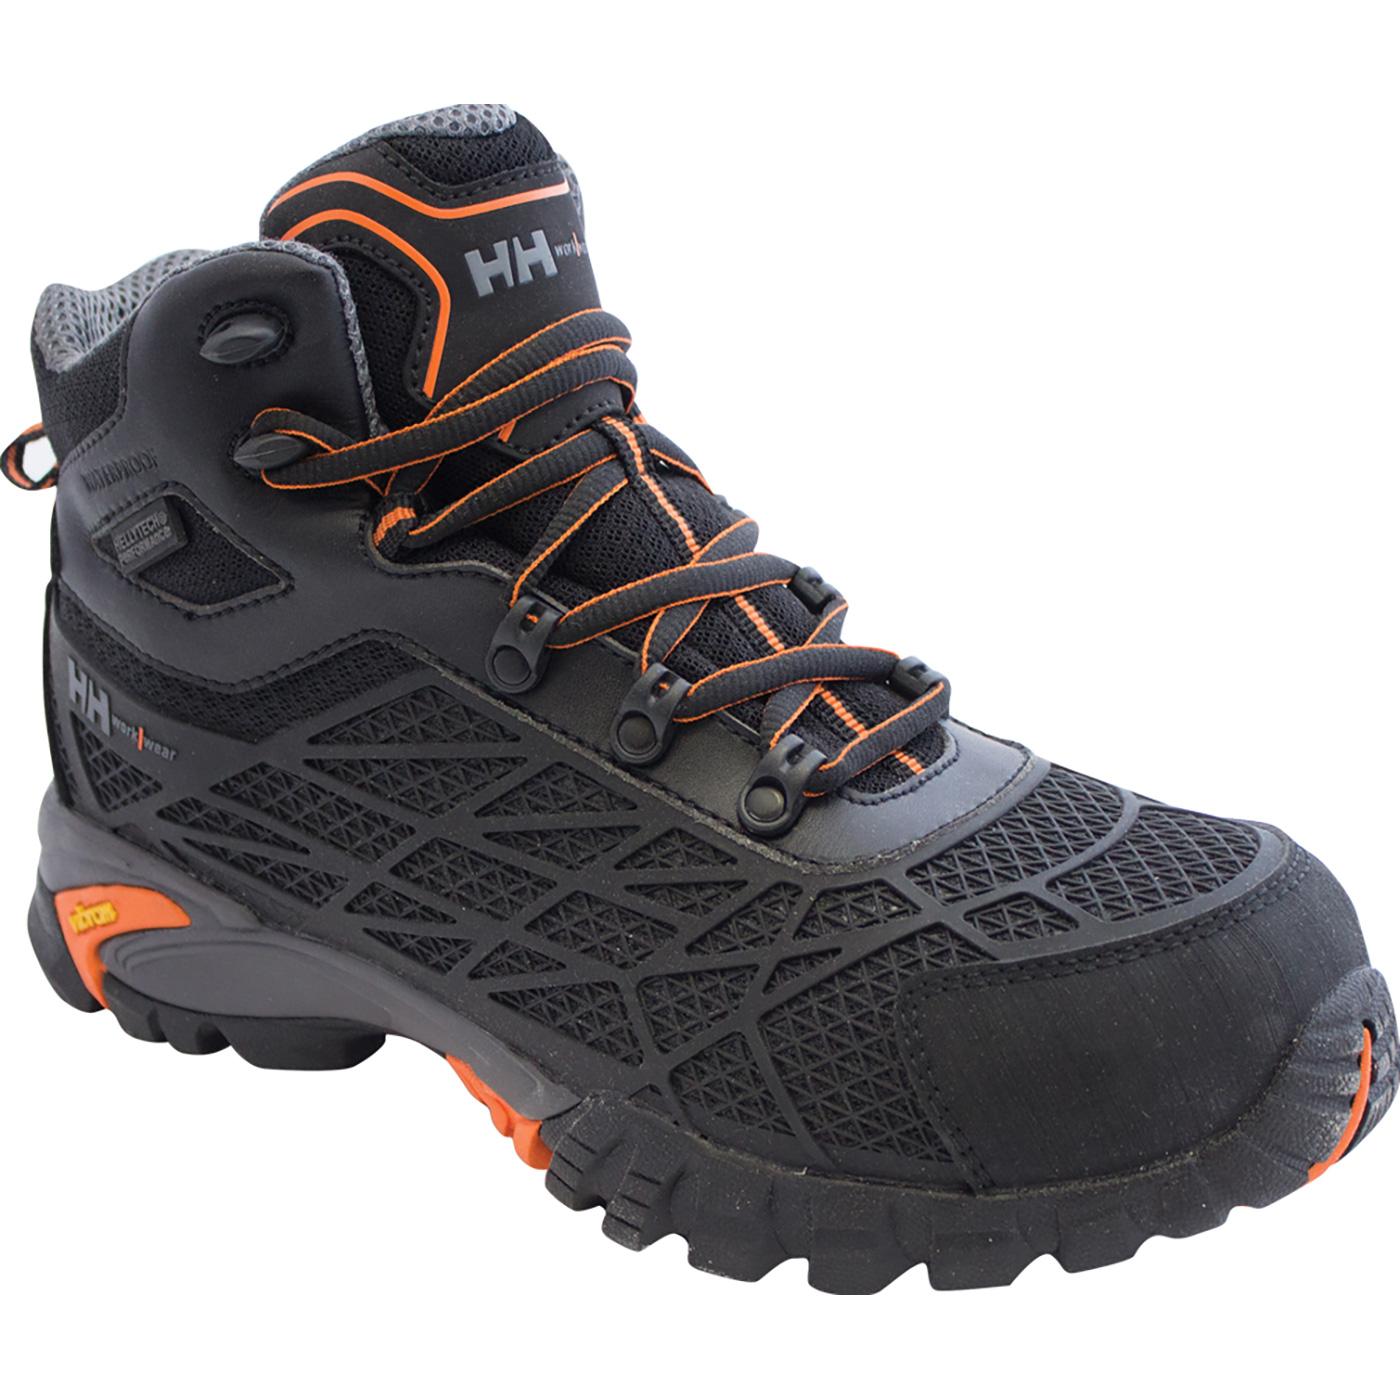 ea58b2e64f01 Helly Hansen TERRENG Men s 5 inch Composite Toe Puncture Resistant  Electrical Hazard Work HikerHelly Hansen TERRENG Men s 5 inch Composite Toe  Puncture ...